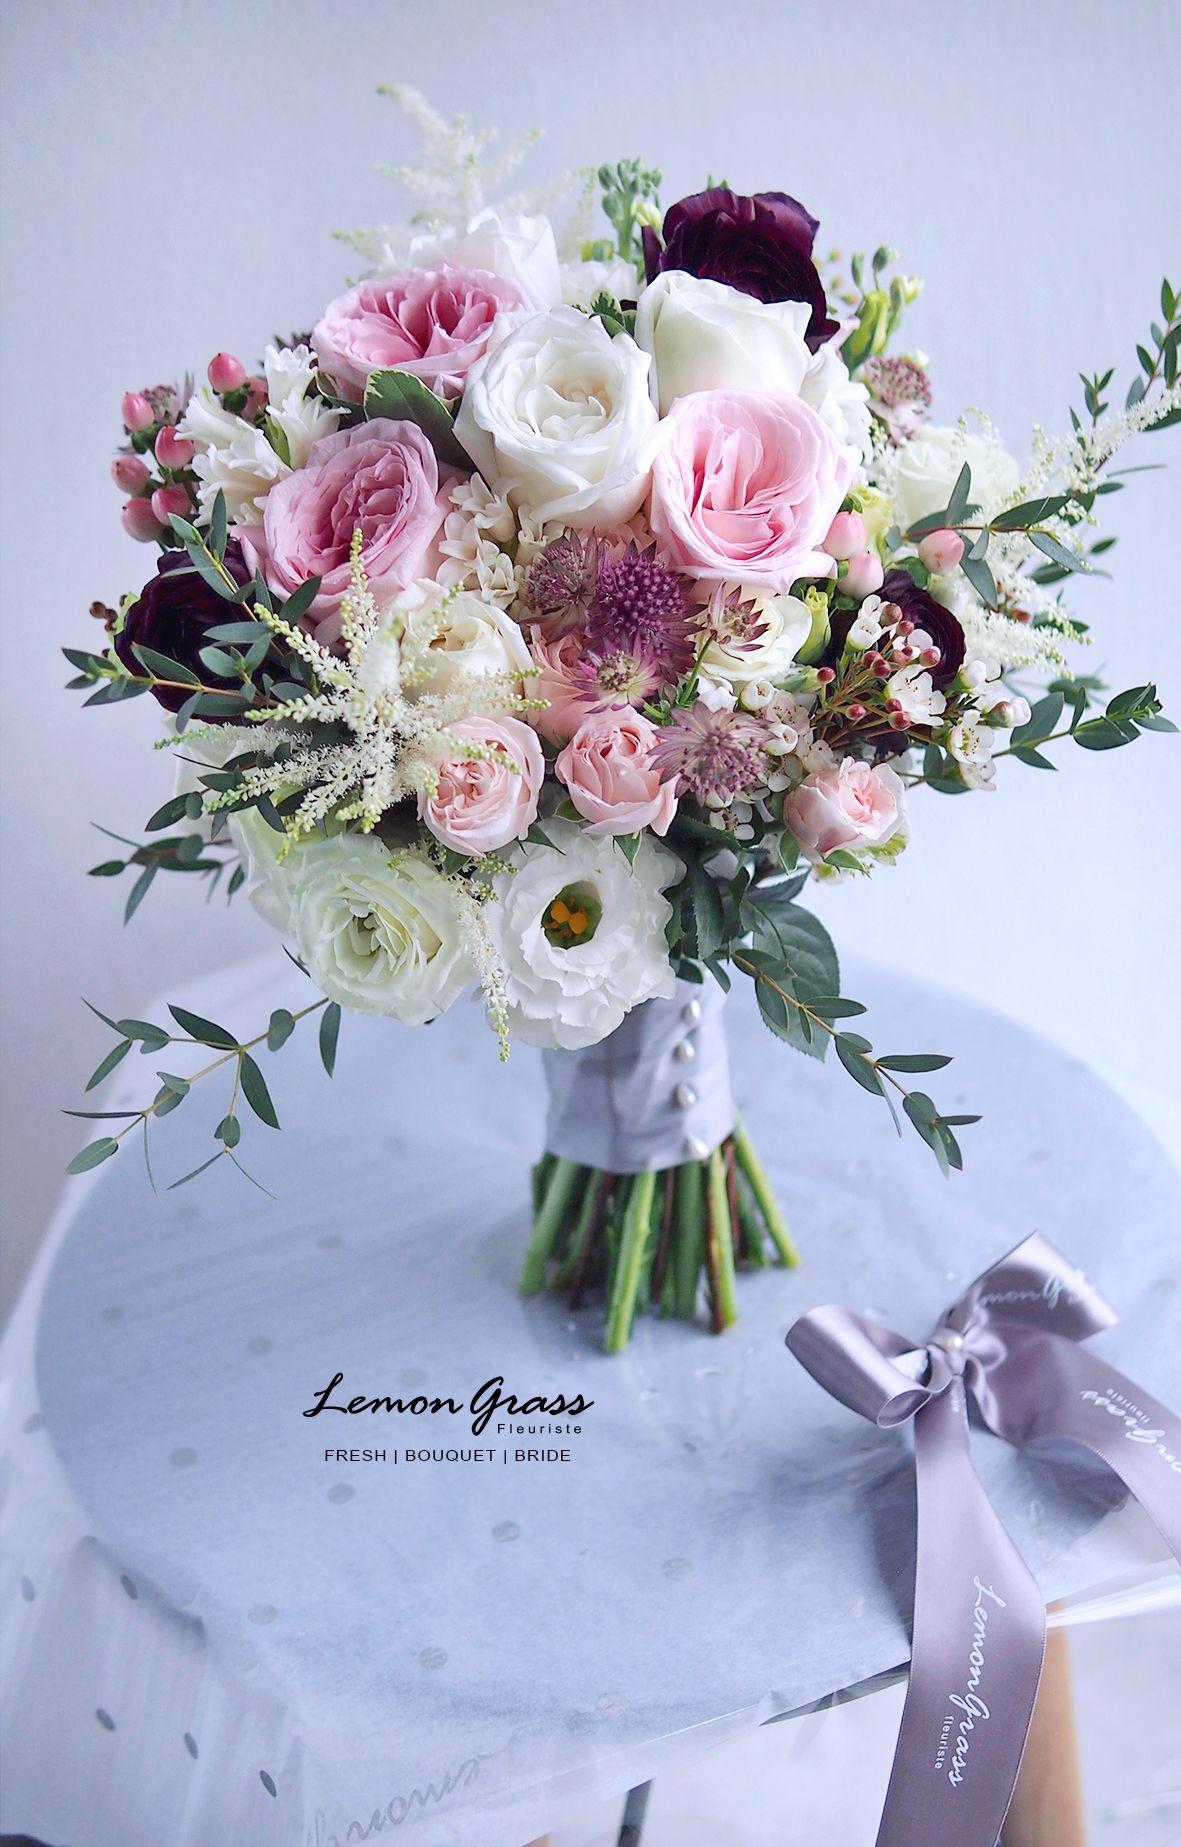 Pin By Lemongrasswedding On Fresh Flower Bouquets Pinterest